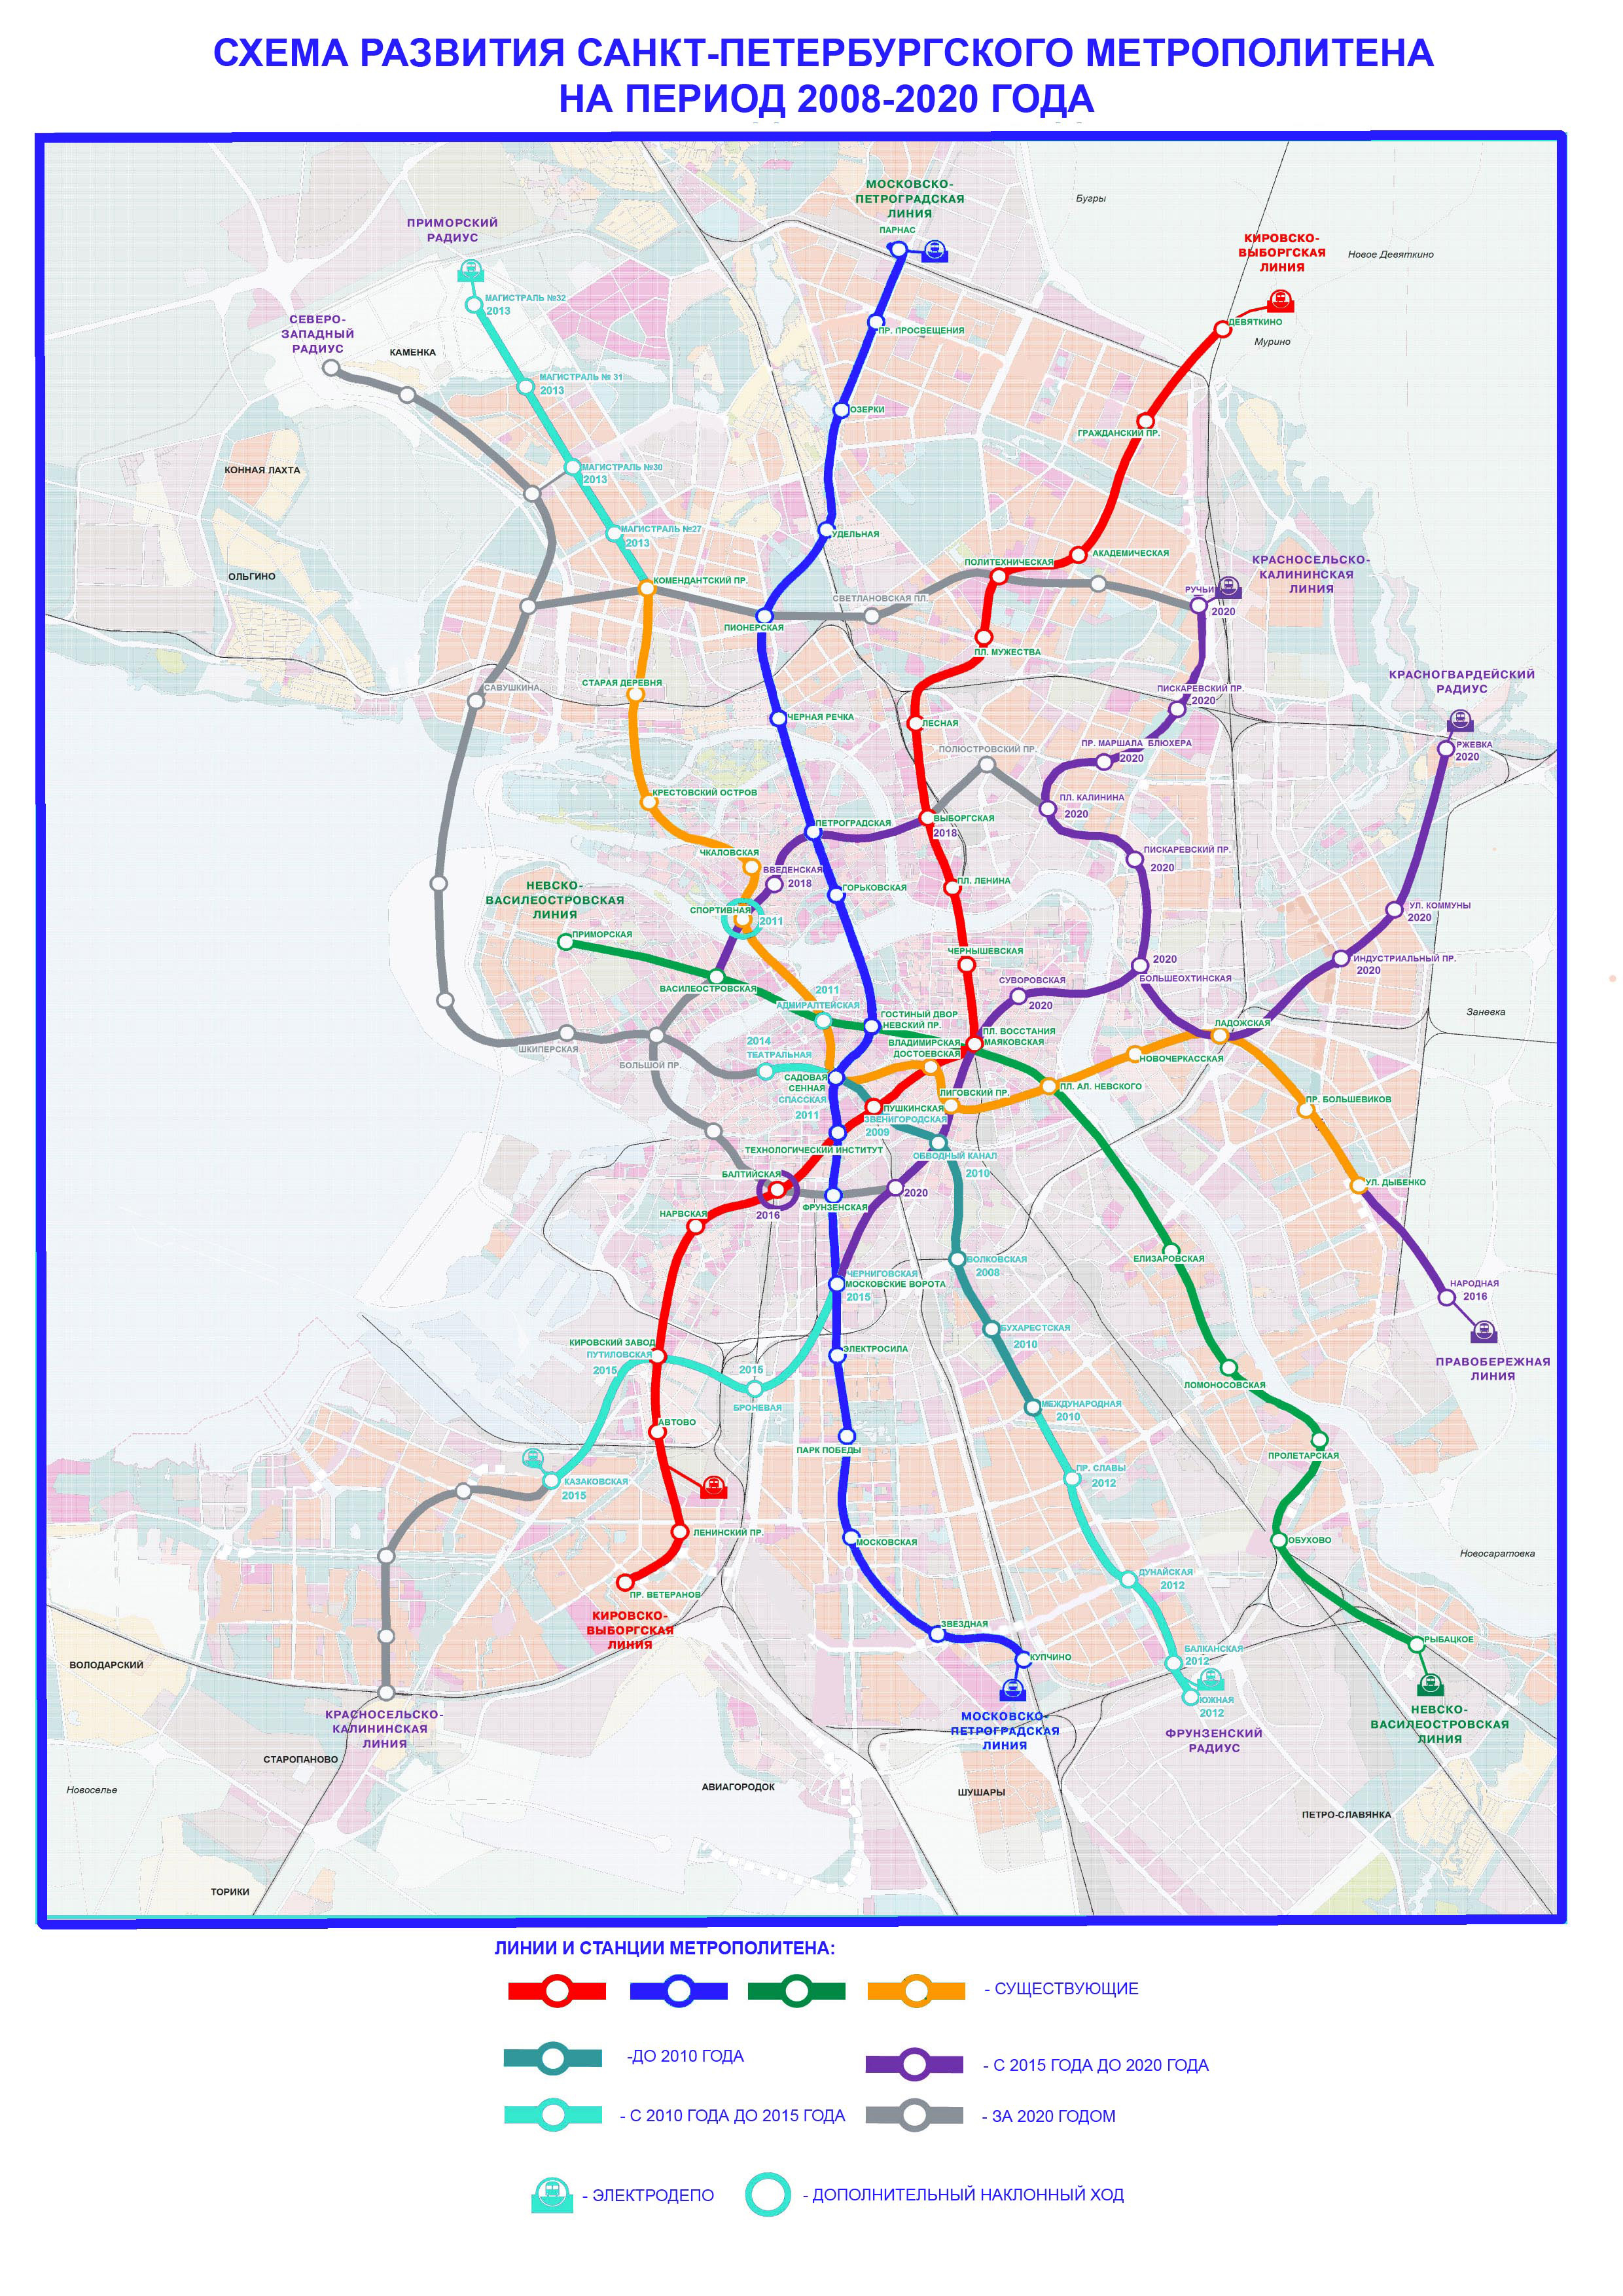 Схема развития метрополитена до 2020 года